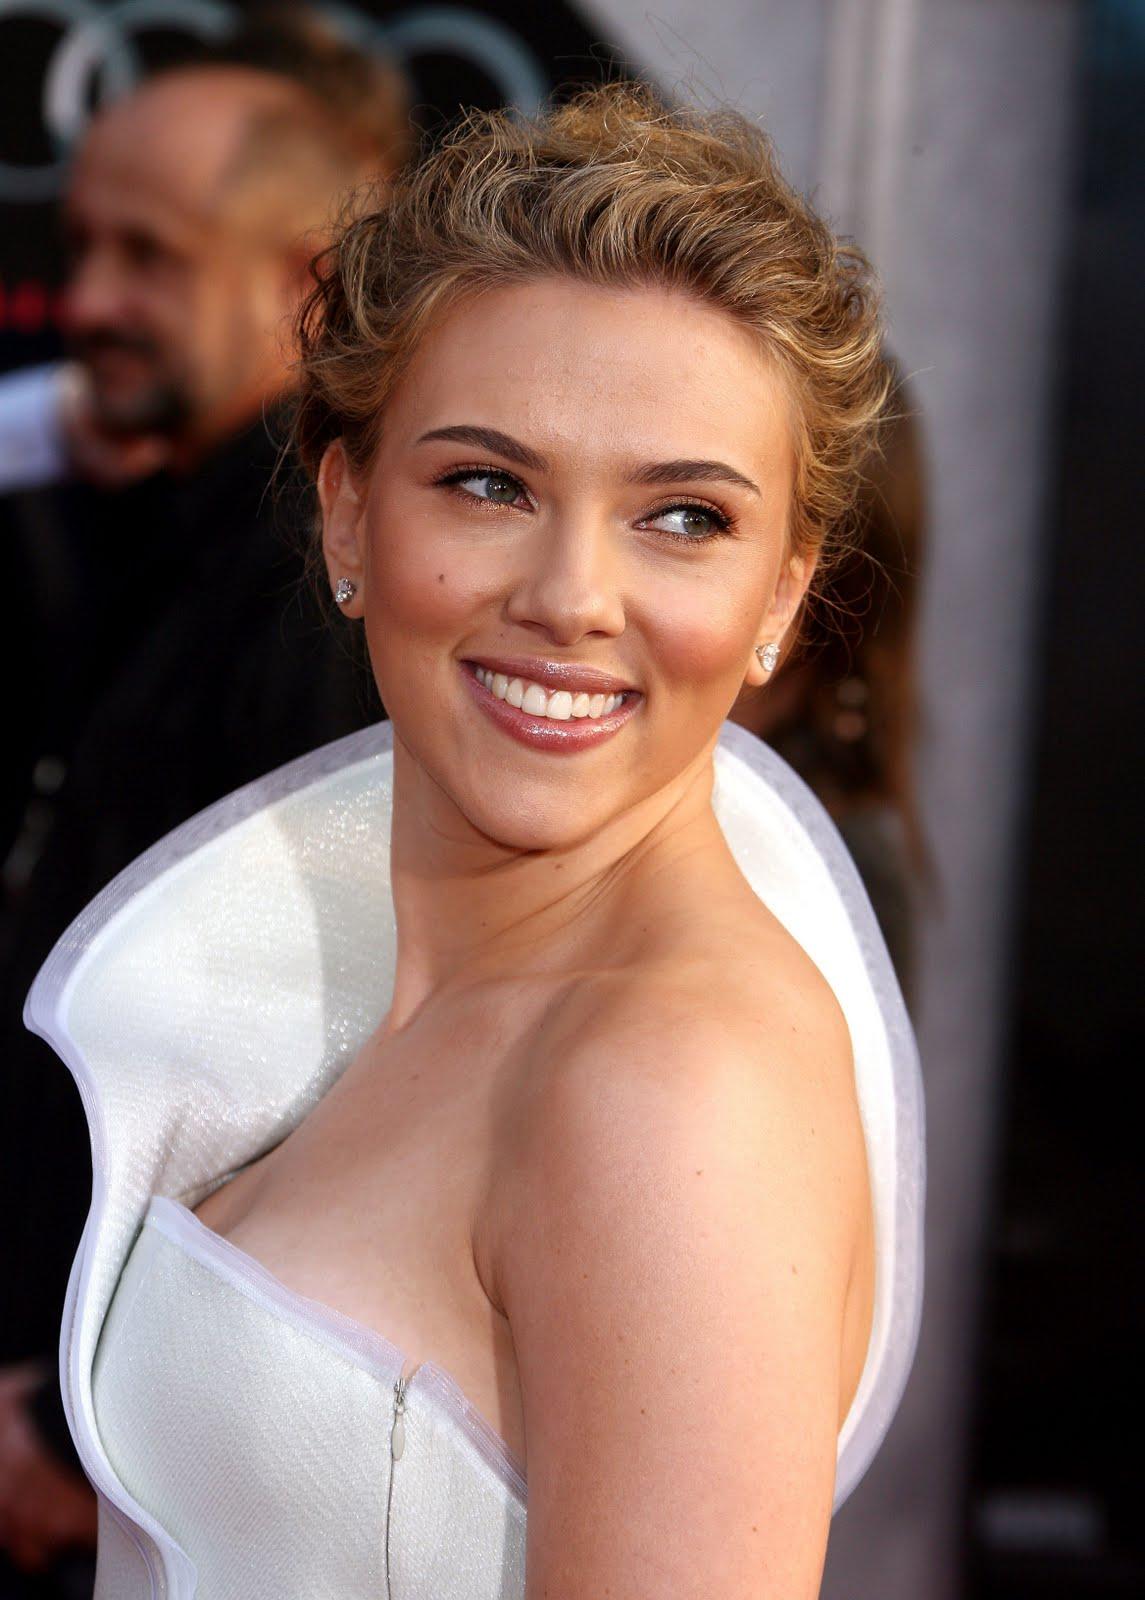 http://2.bp.blogspot.com/-oK7woJijnLA/TgRmvMxlFZI/AAAAAAAAFDs/z5LnlSL-TaU/s1600/Scarlett-Johansson-8.jpg